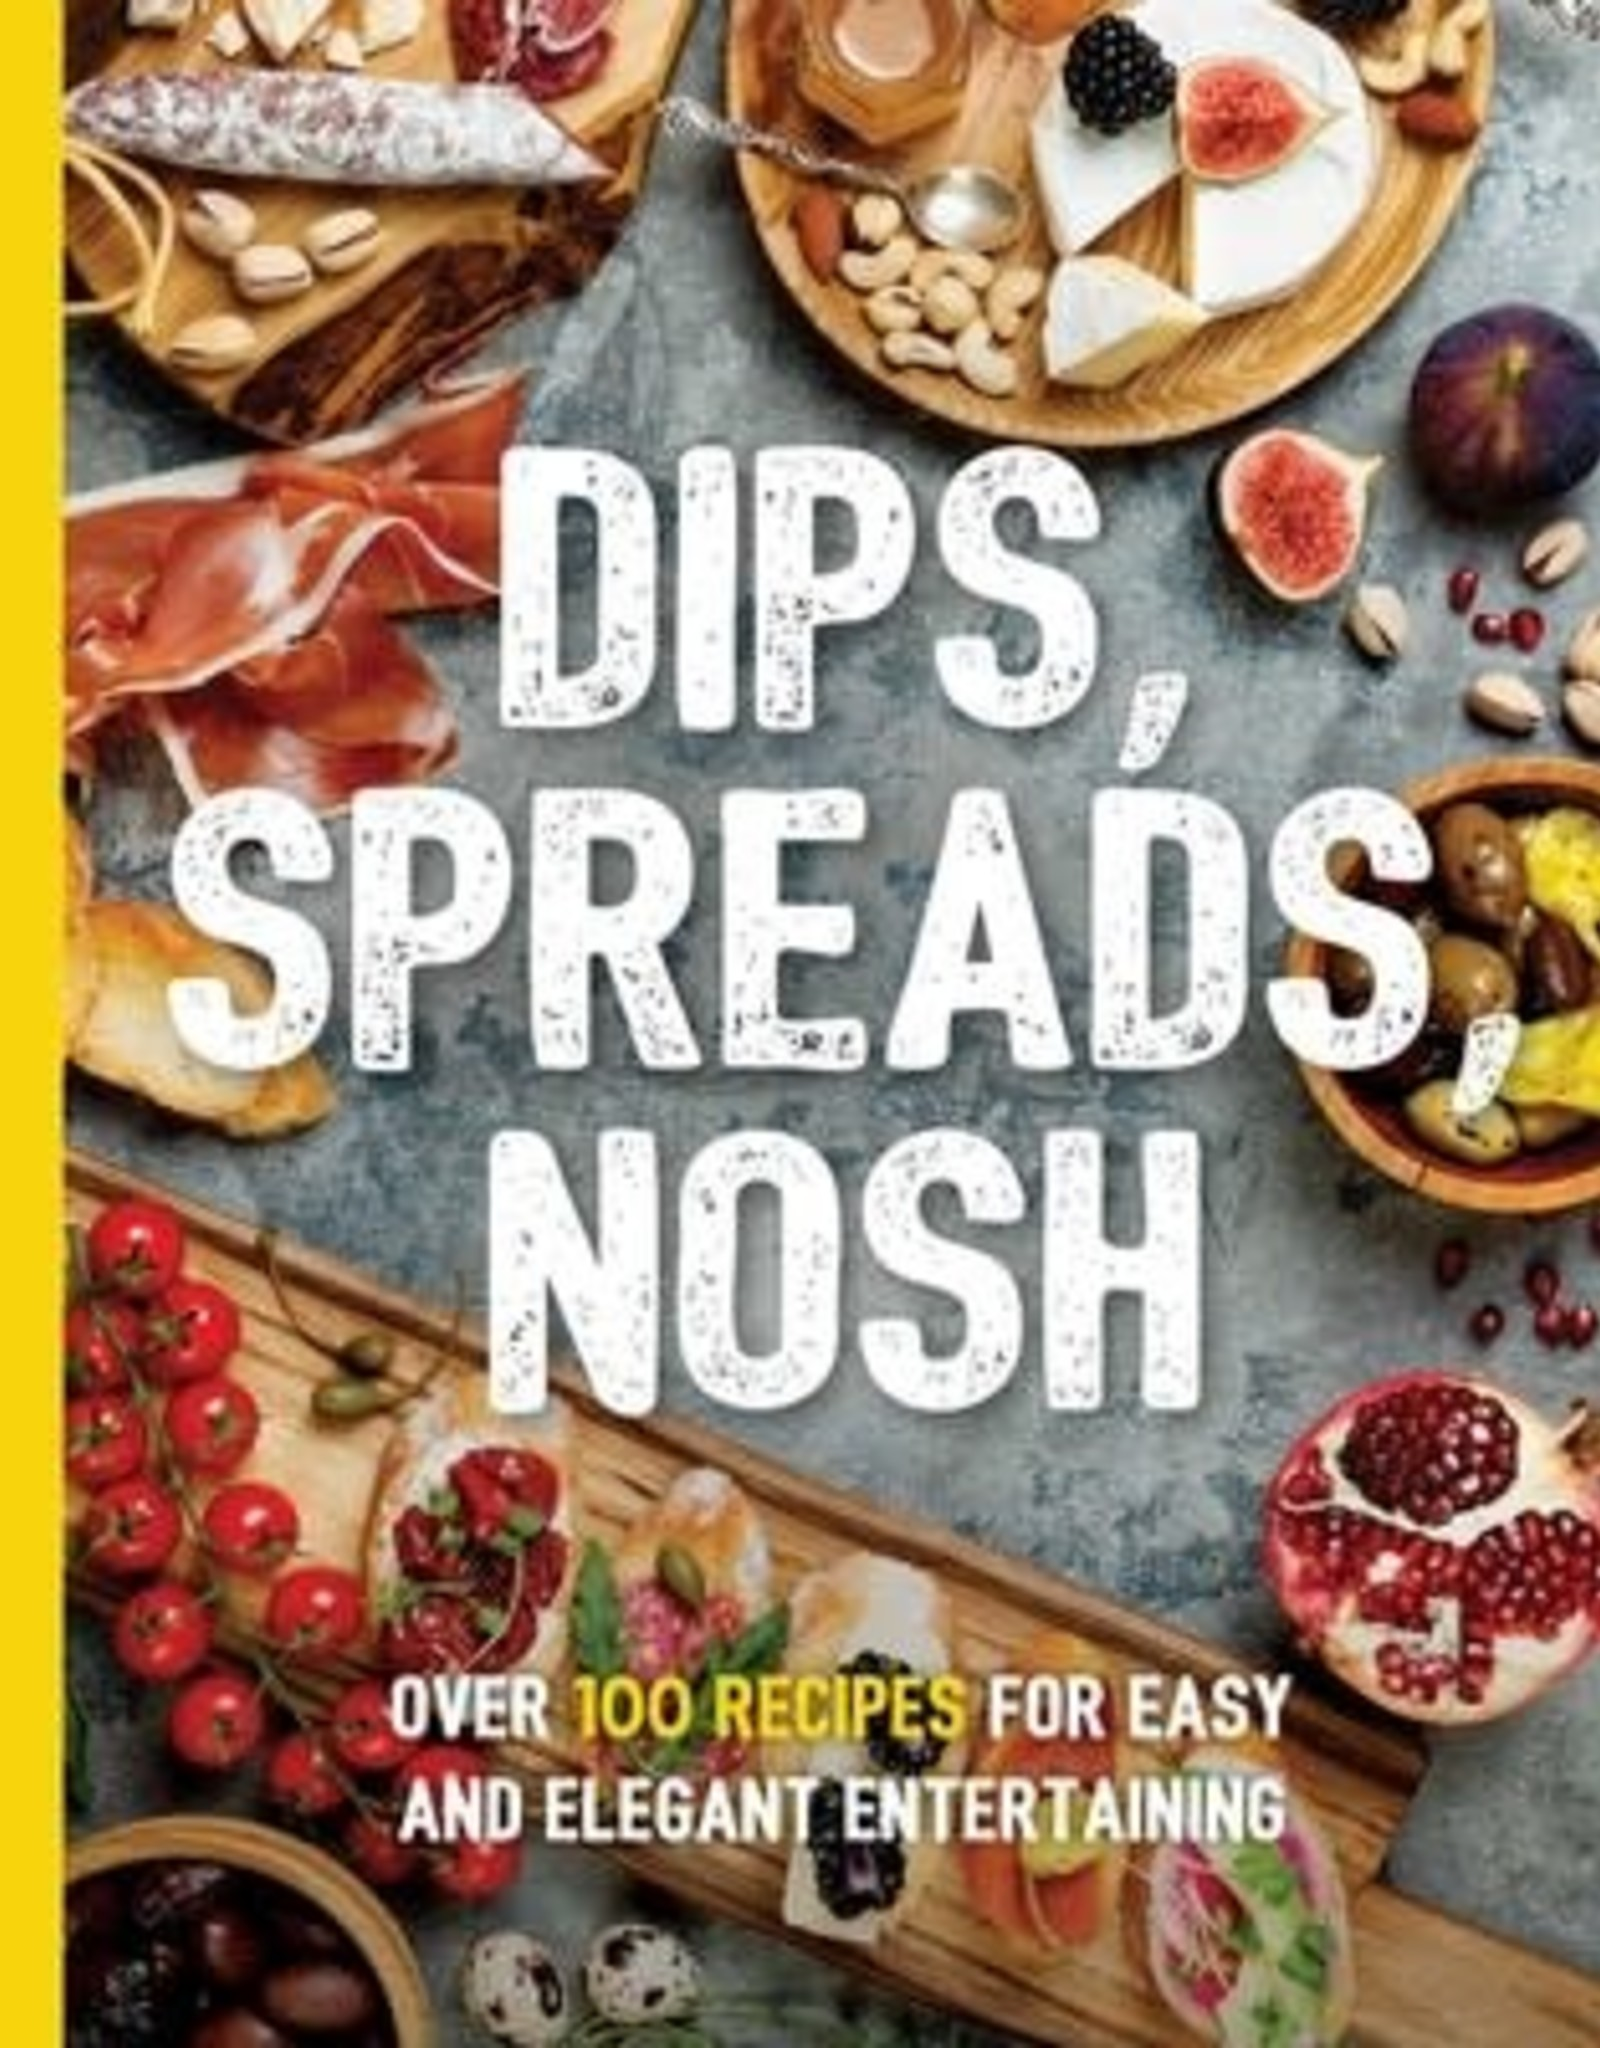 Dips, Spreads, Nosh by Kimberly Stevens